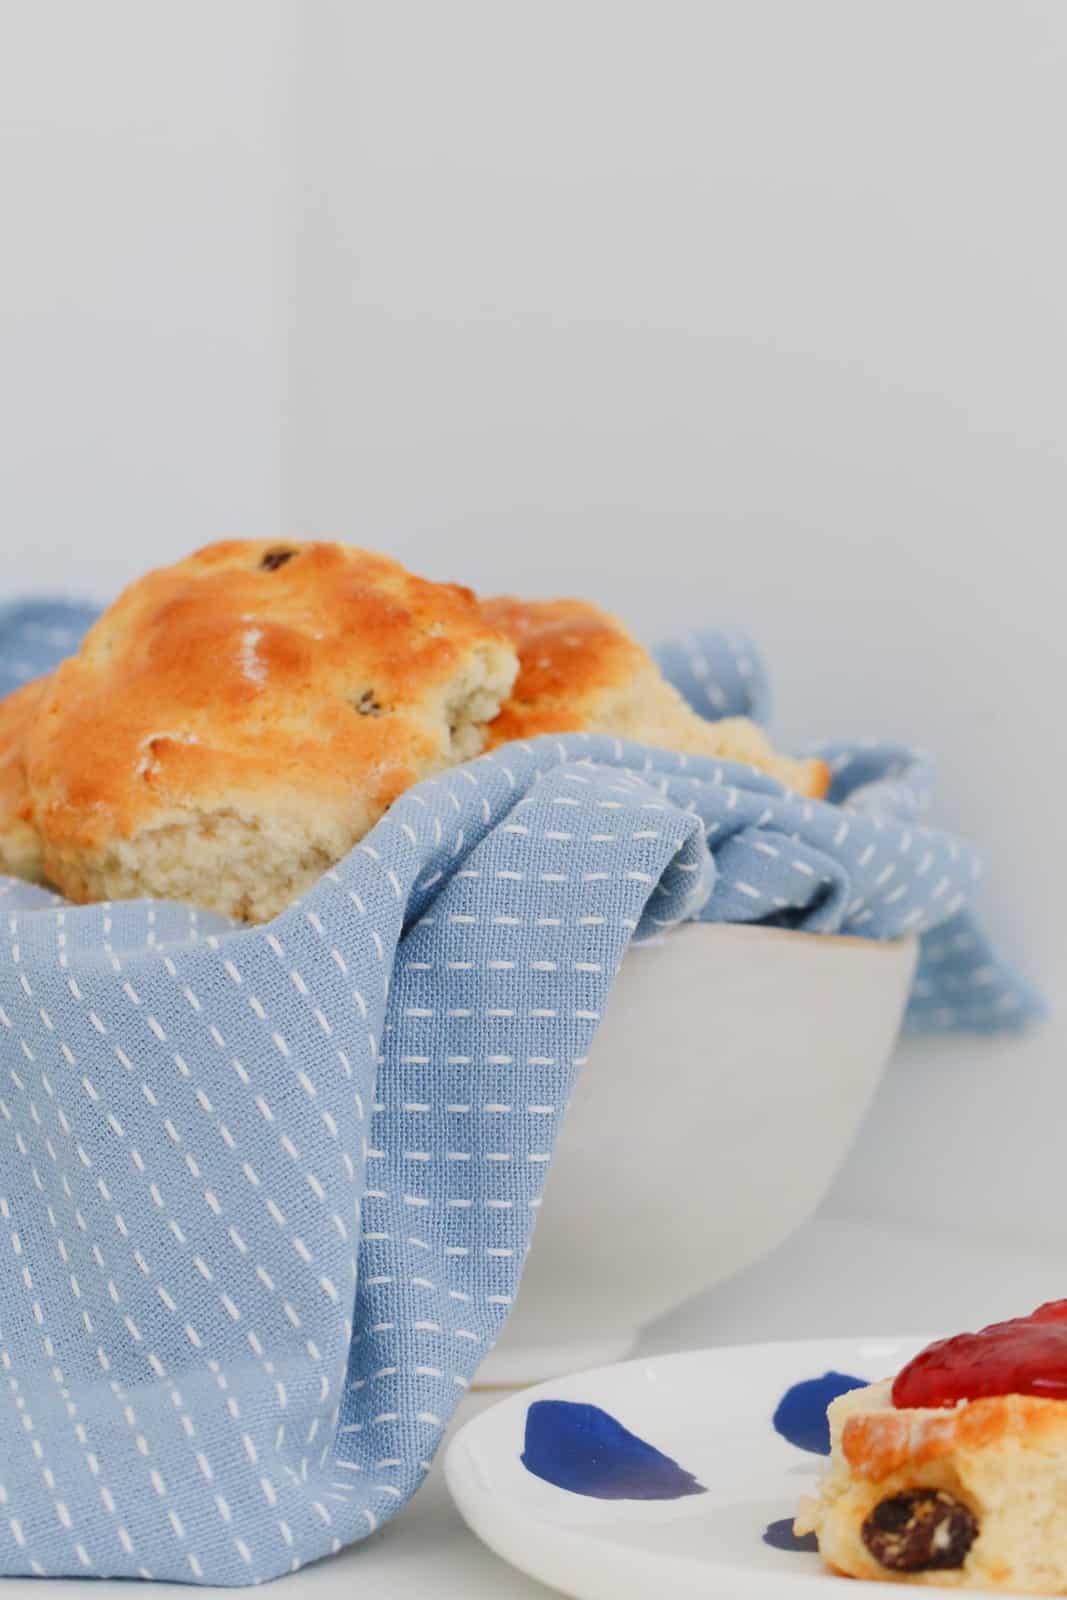 Golden fruit scones wrapped in light blue tea towel in white bowl